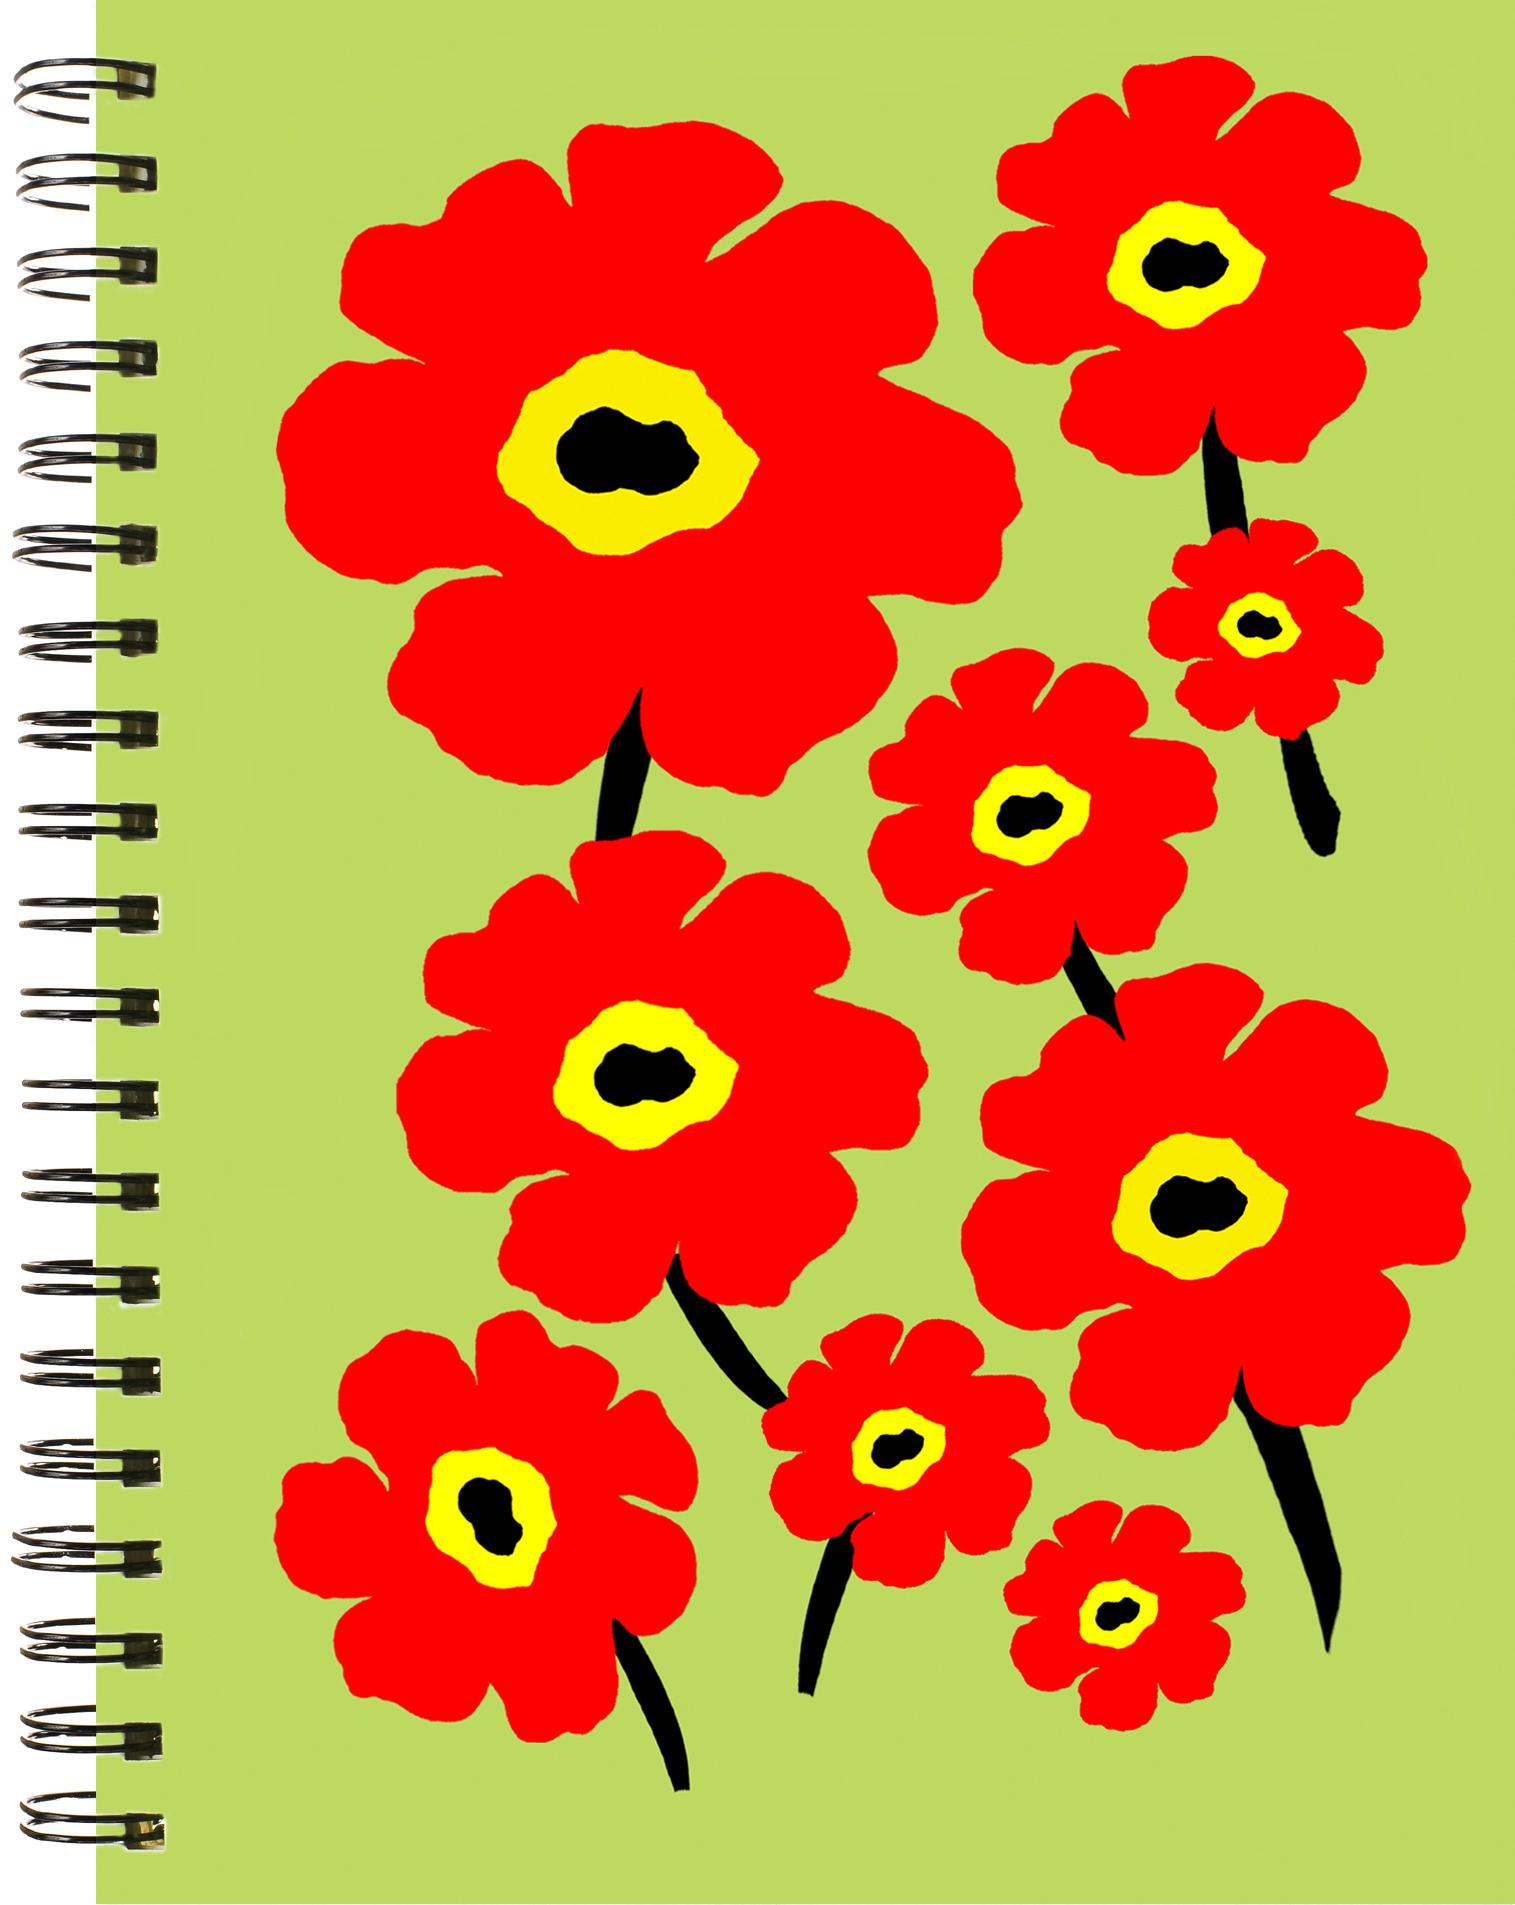 LittleNoteCard_FlowerPower_OrangeLime_Journal